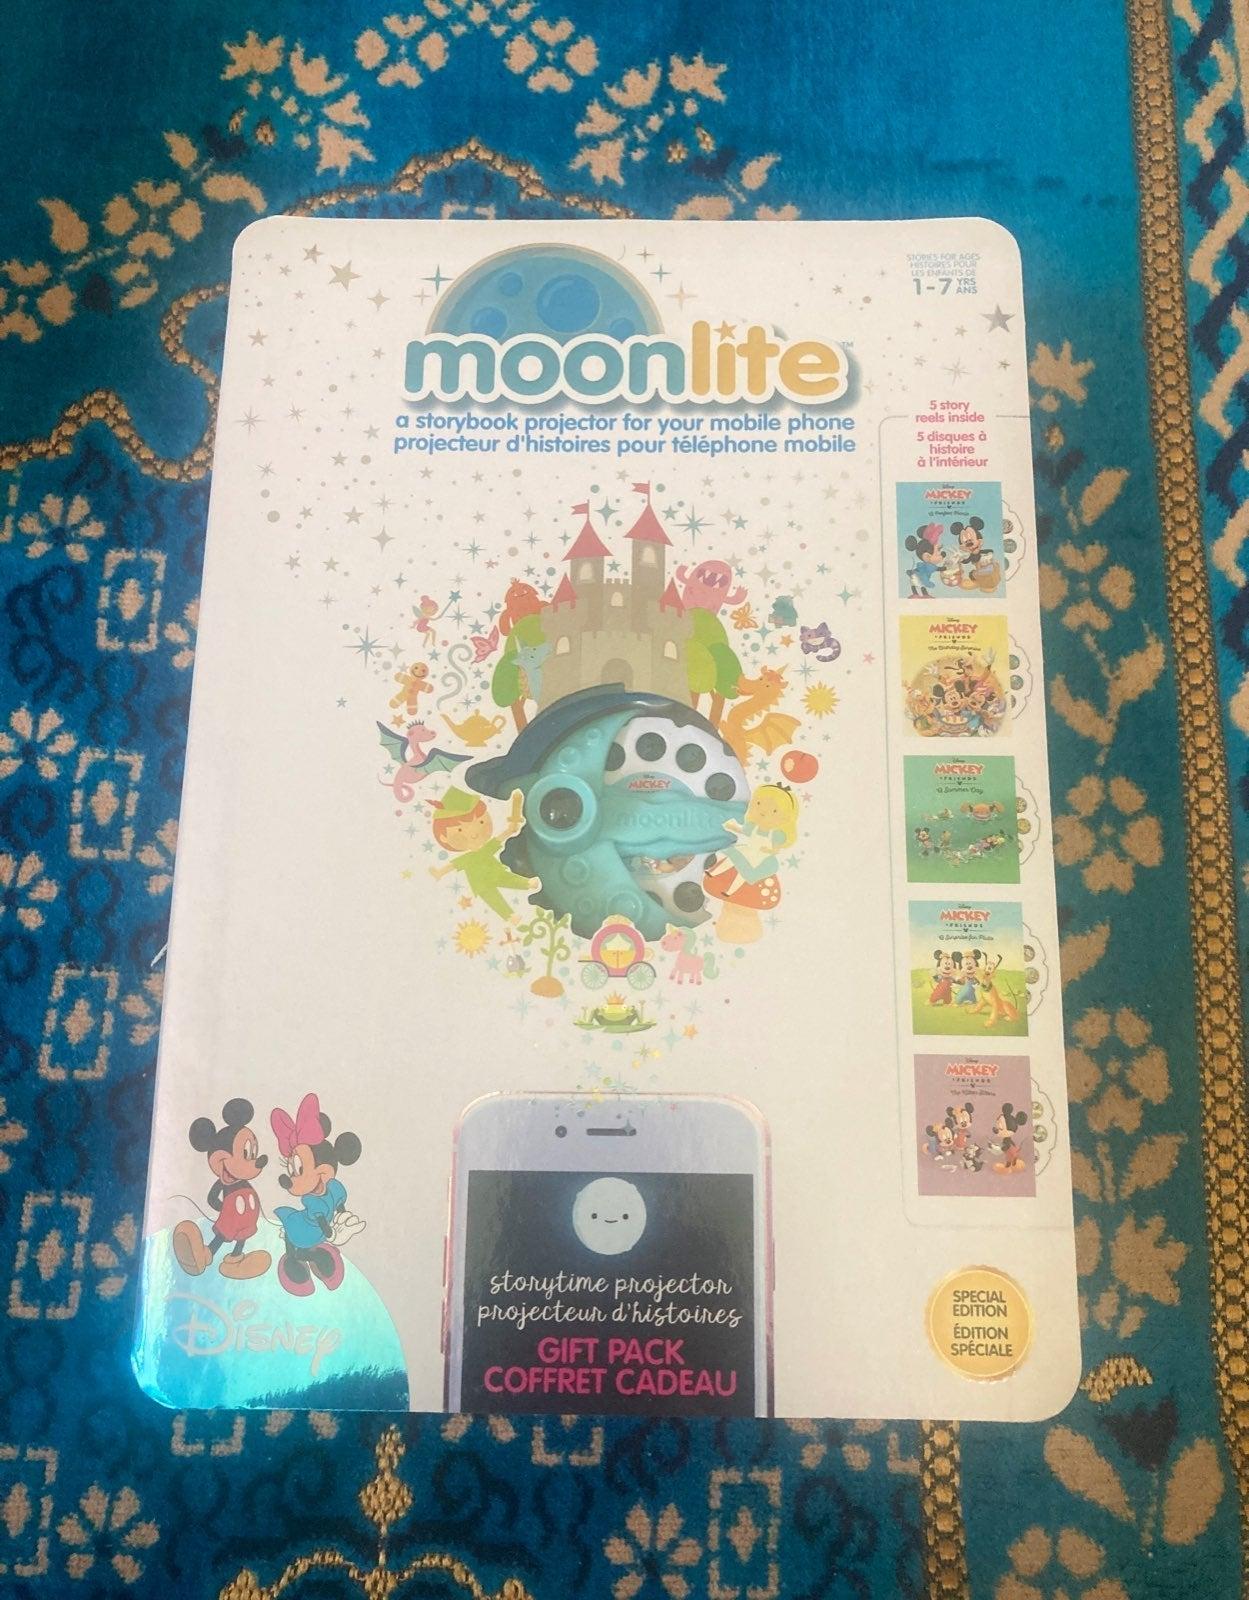 Moonlite Storybook projector Disney